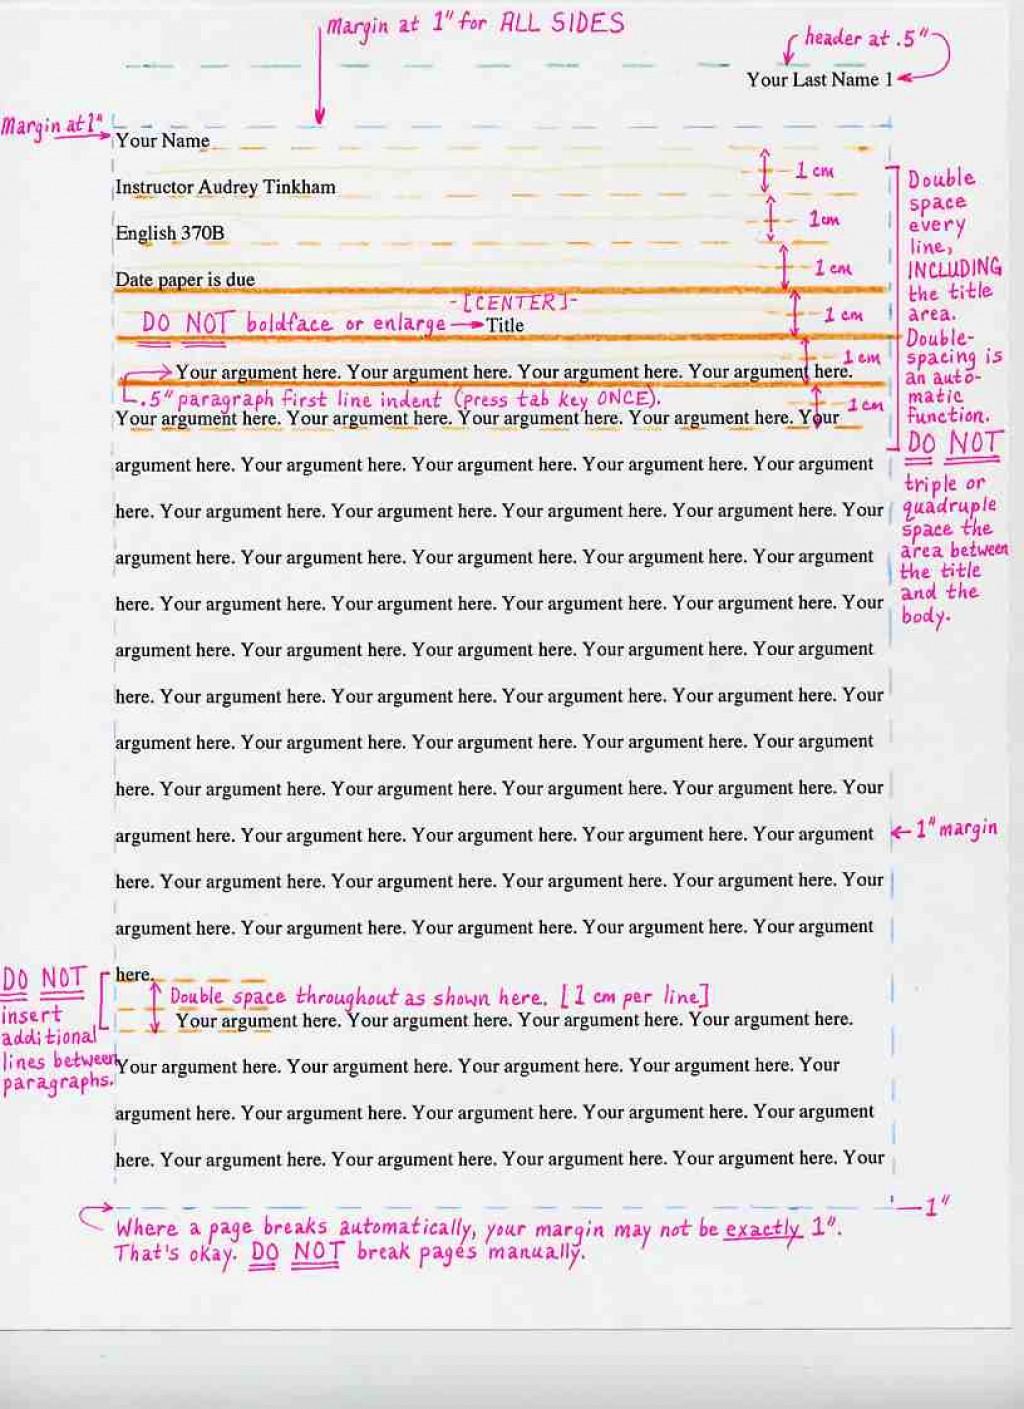 010 Img067 Essay Example Amazing Style Styles Of Communication Music Writing Guide Large